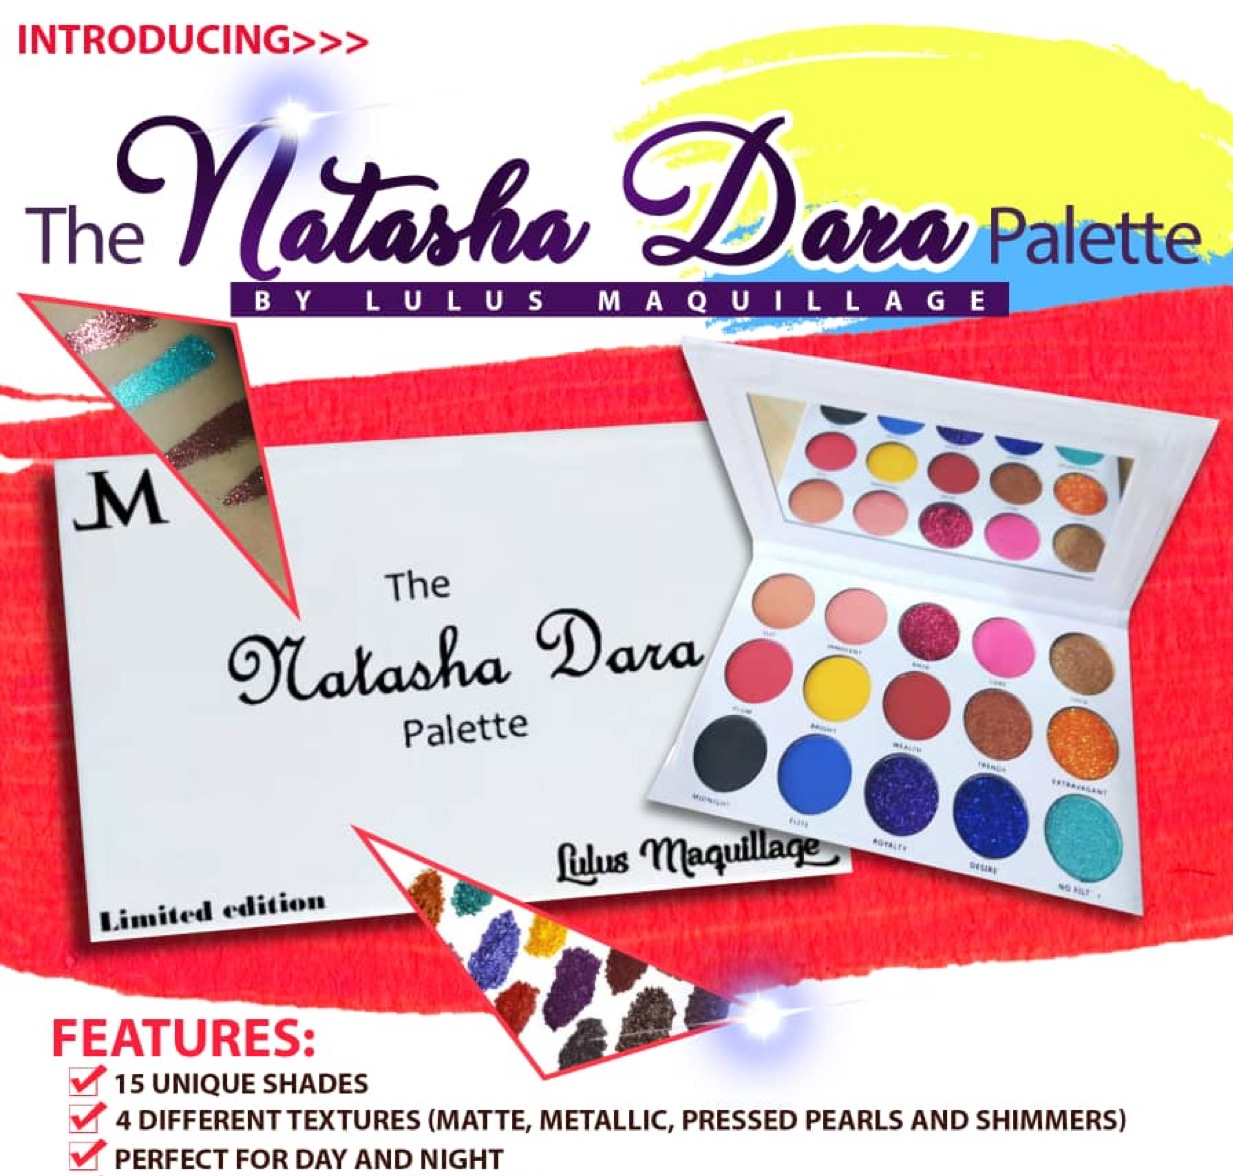 INTRODUCING➡️ THE NATASHA DARA PALETTE